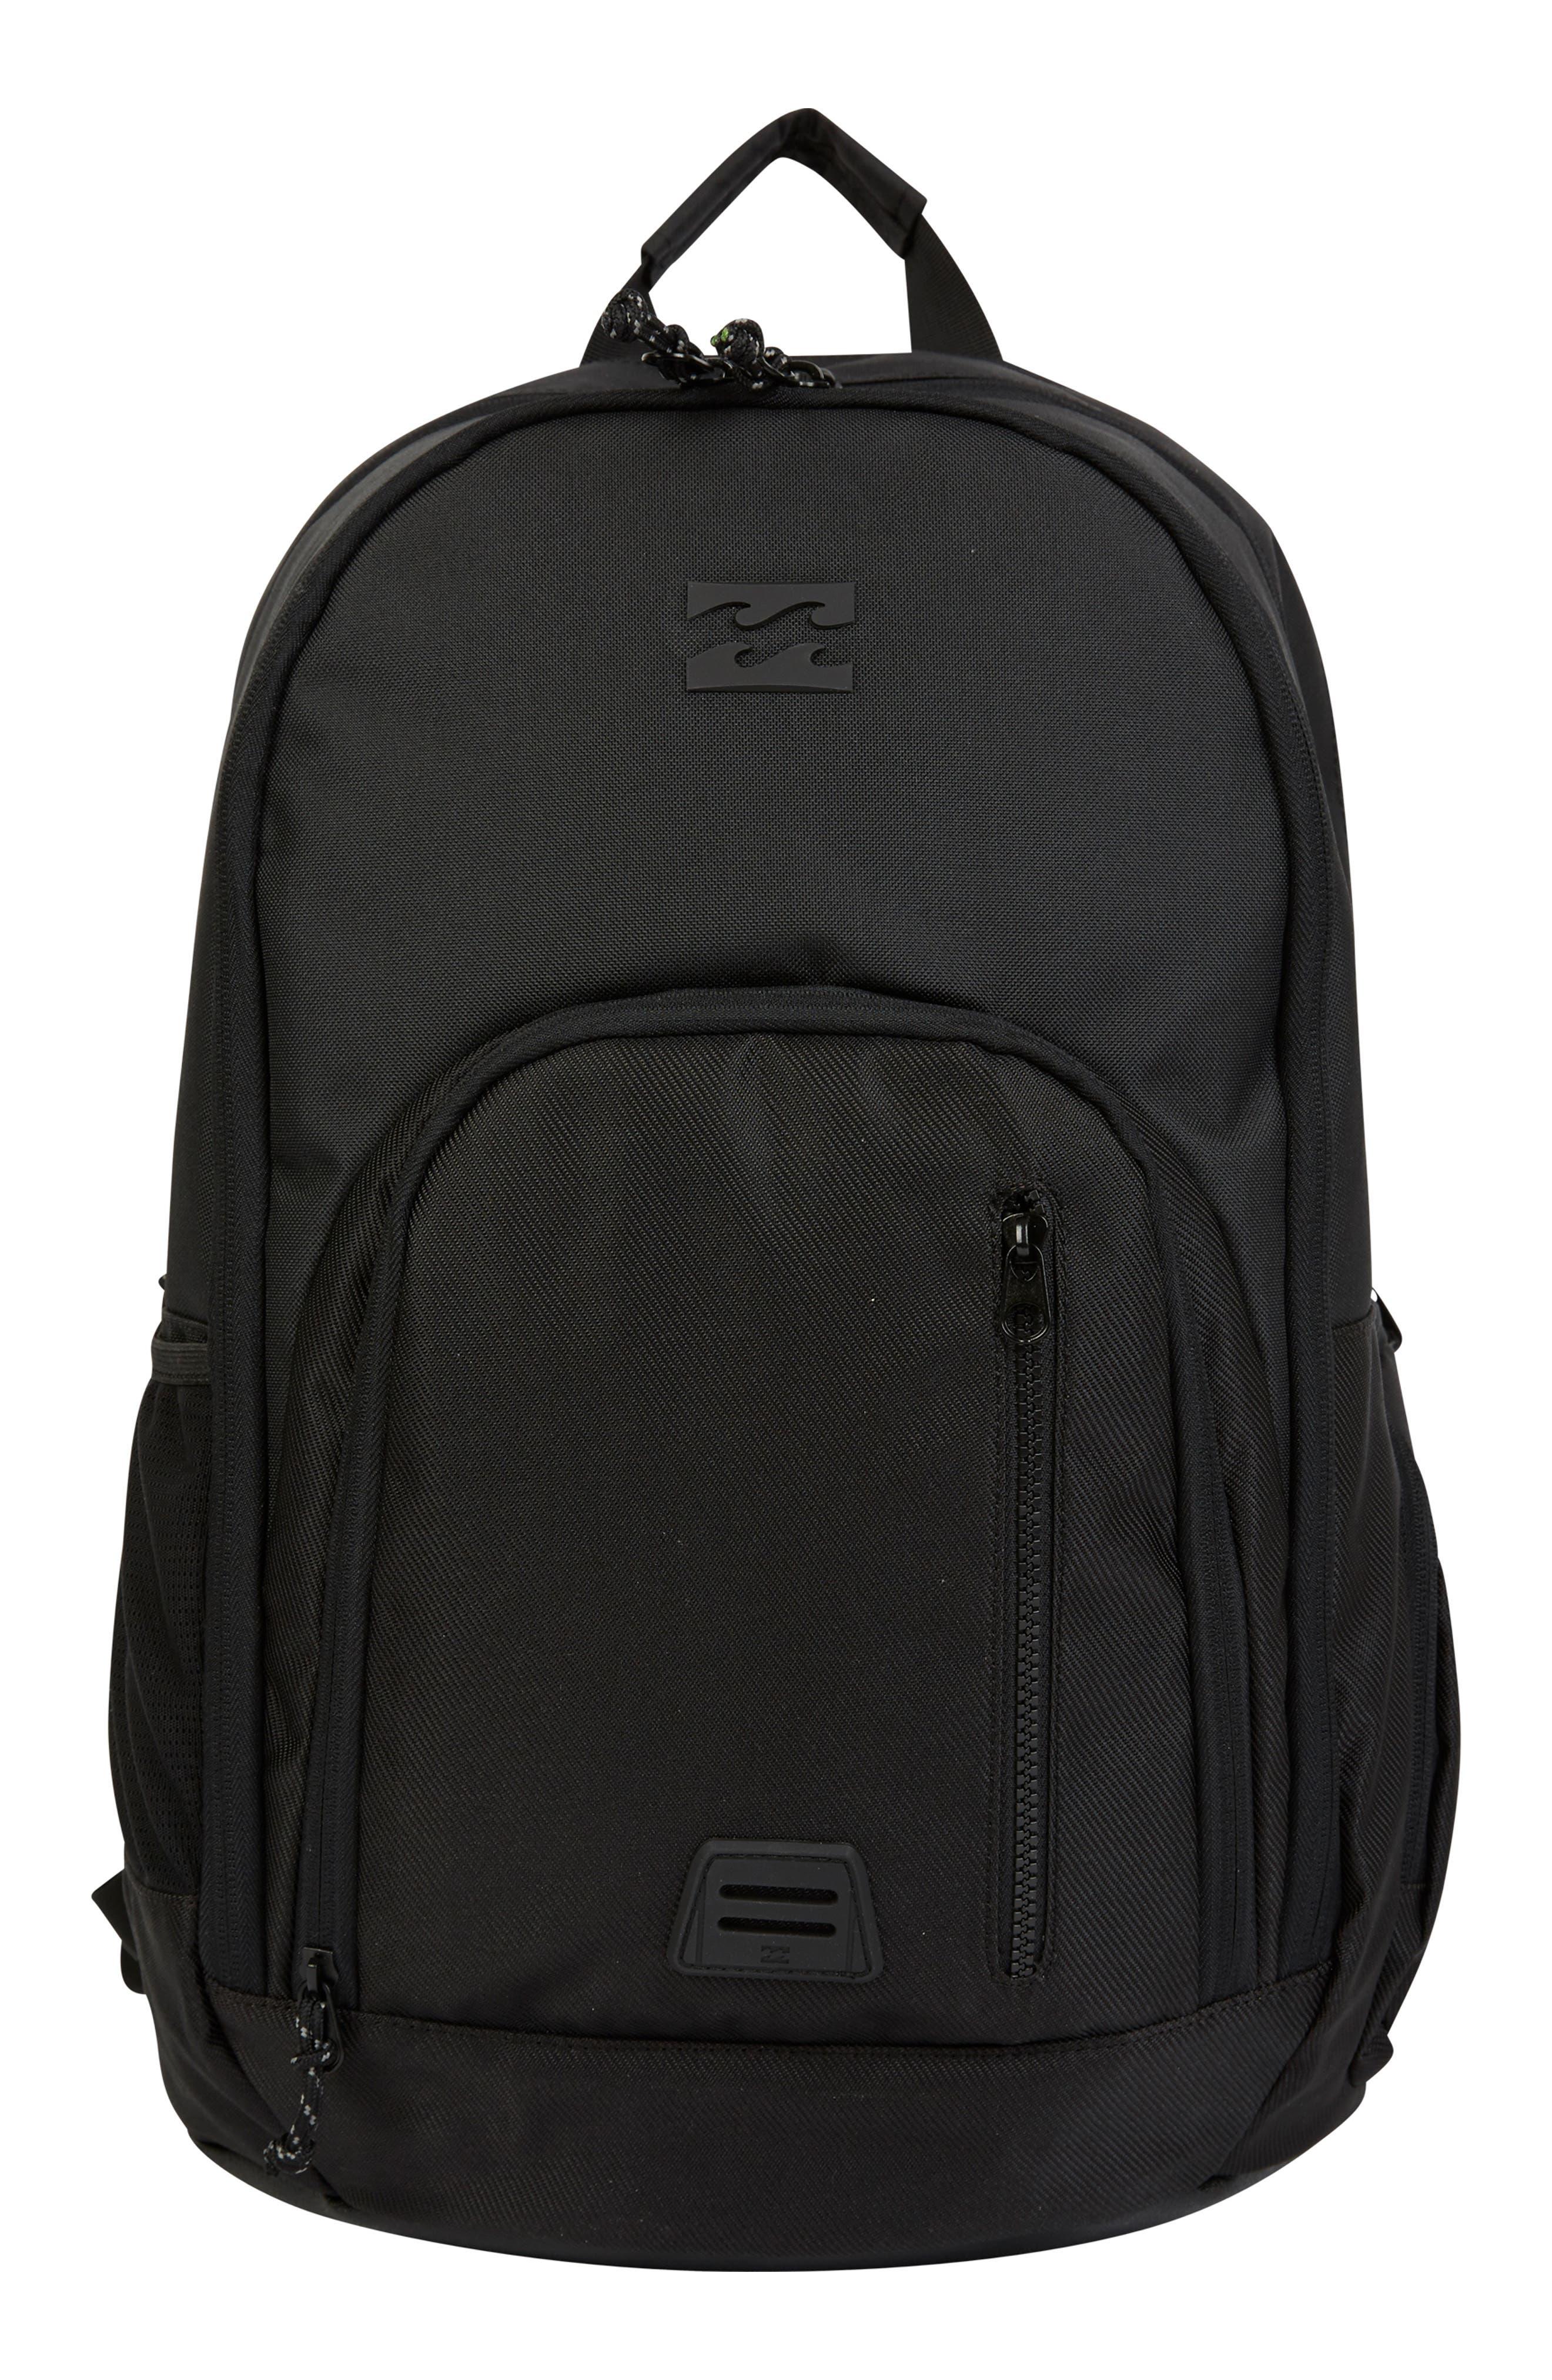 Billabong Command Backpack - Black